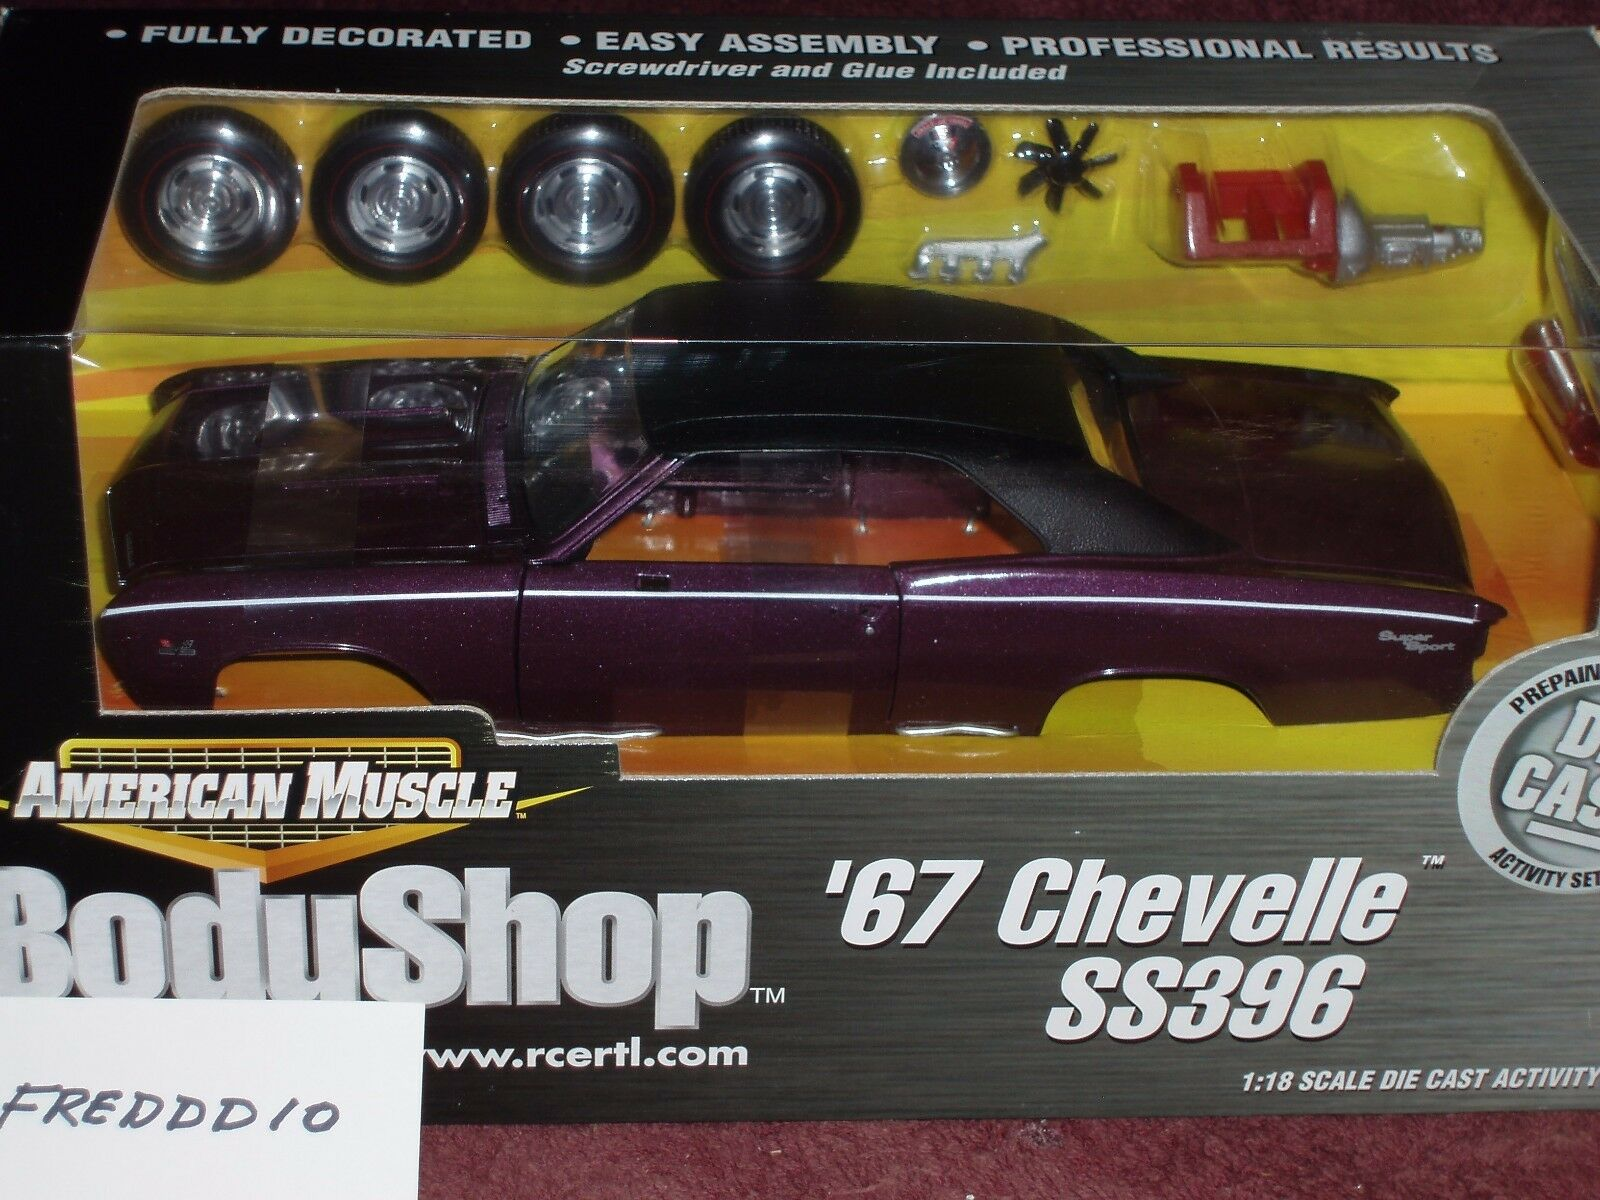 Ertl 1967 chevy chevelle ss396 lila body shop - versammlung - modell - 1   18 vhtf